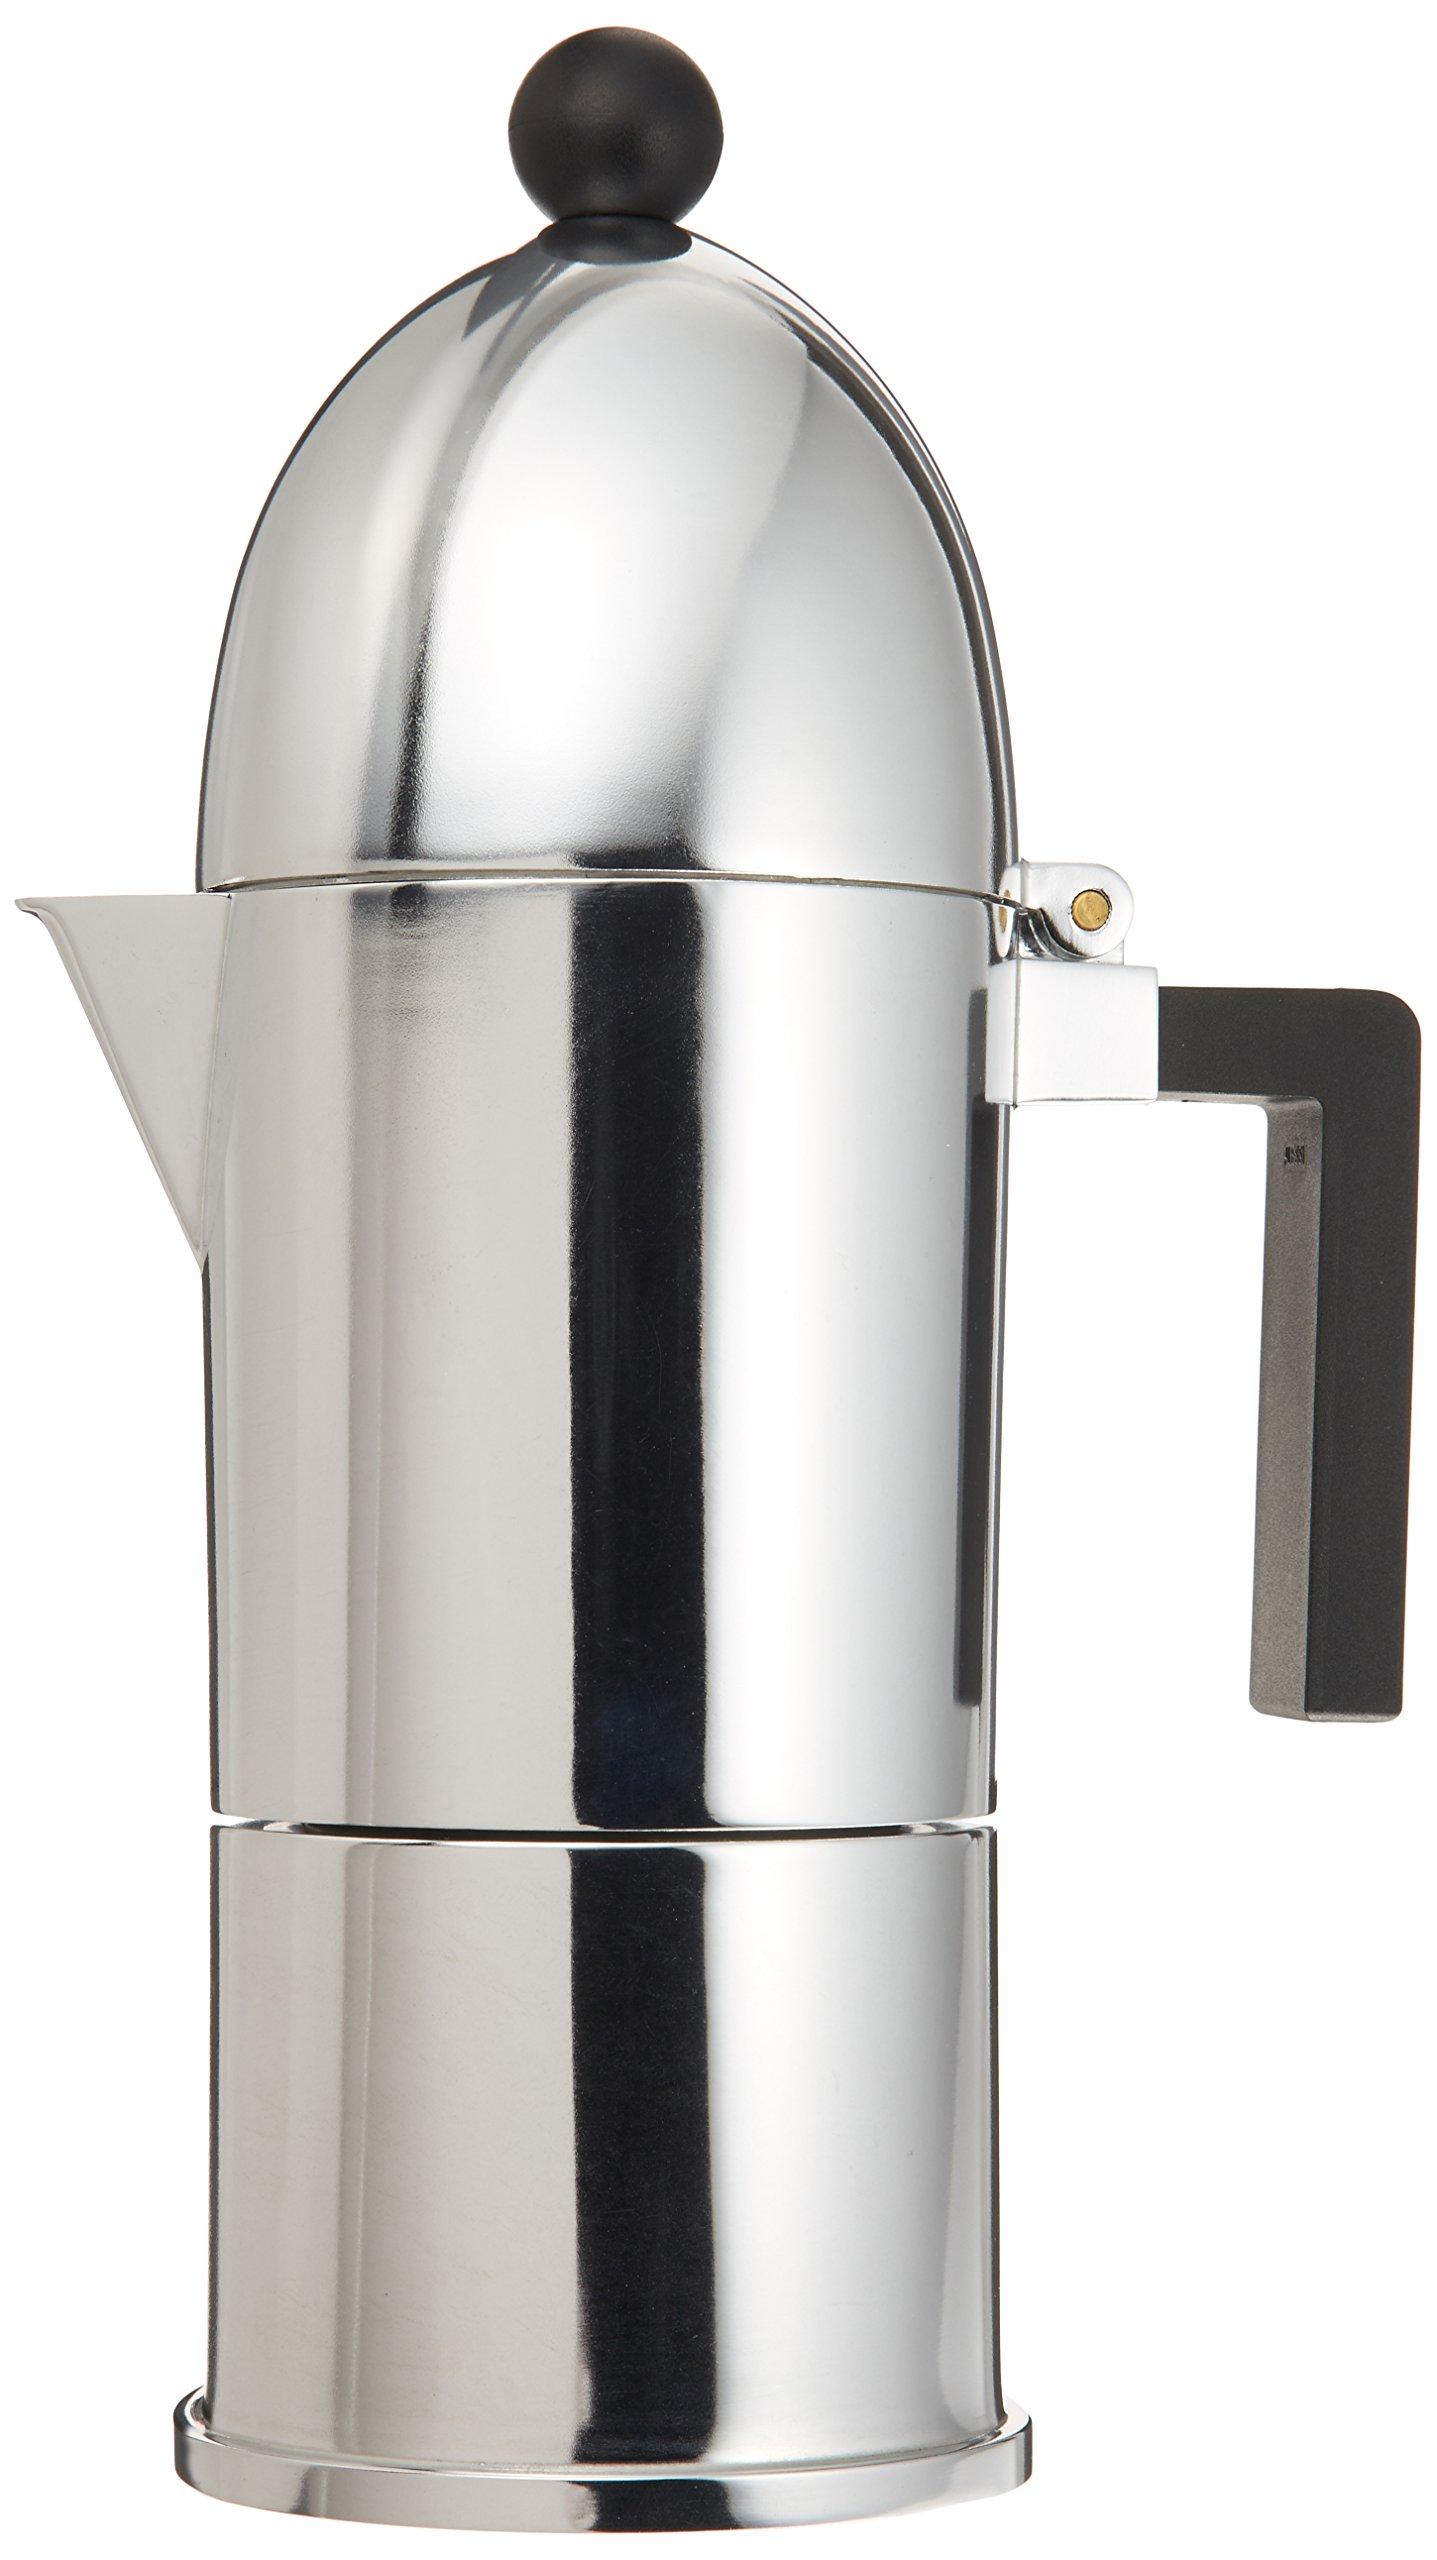 Alessi A9095/6 B La Cupola 6-Cup Silver Aluminum Espresso Maker With Black Handle by Alessi